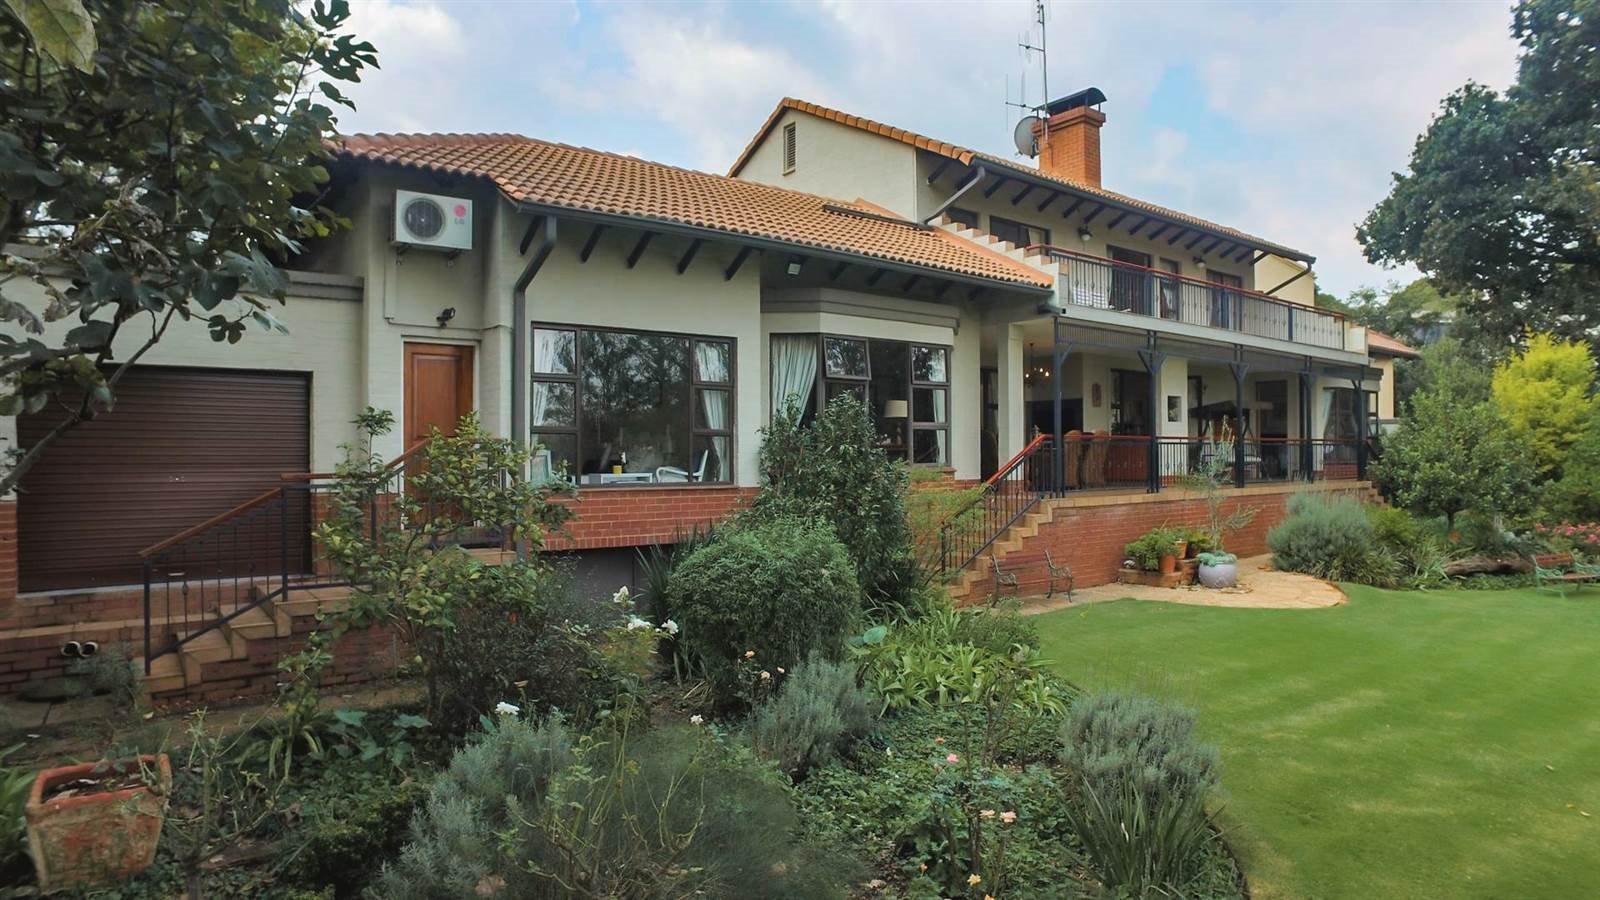 Centurion, Centurion Golf Estate Property  | Houses For Sale Centurion Golf Estate, Centurion Golf Estate, House 4 bedrooms property for sale Price:4,500,000